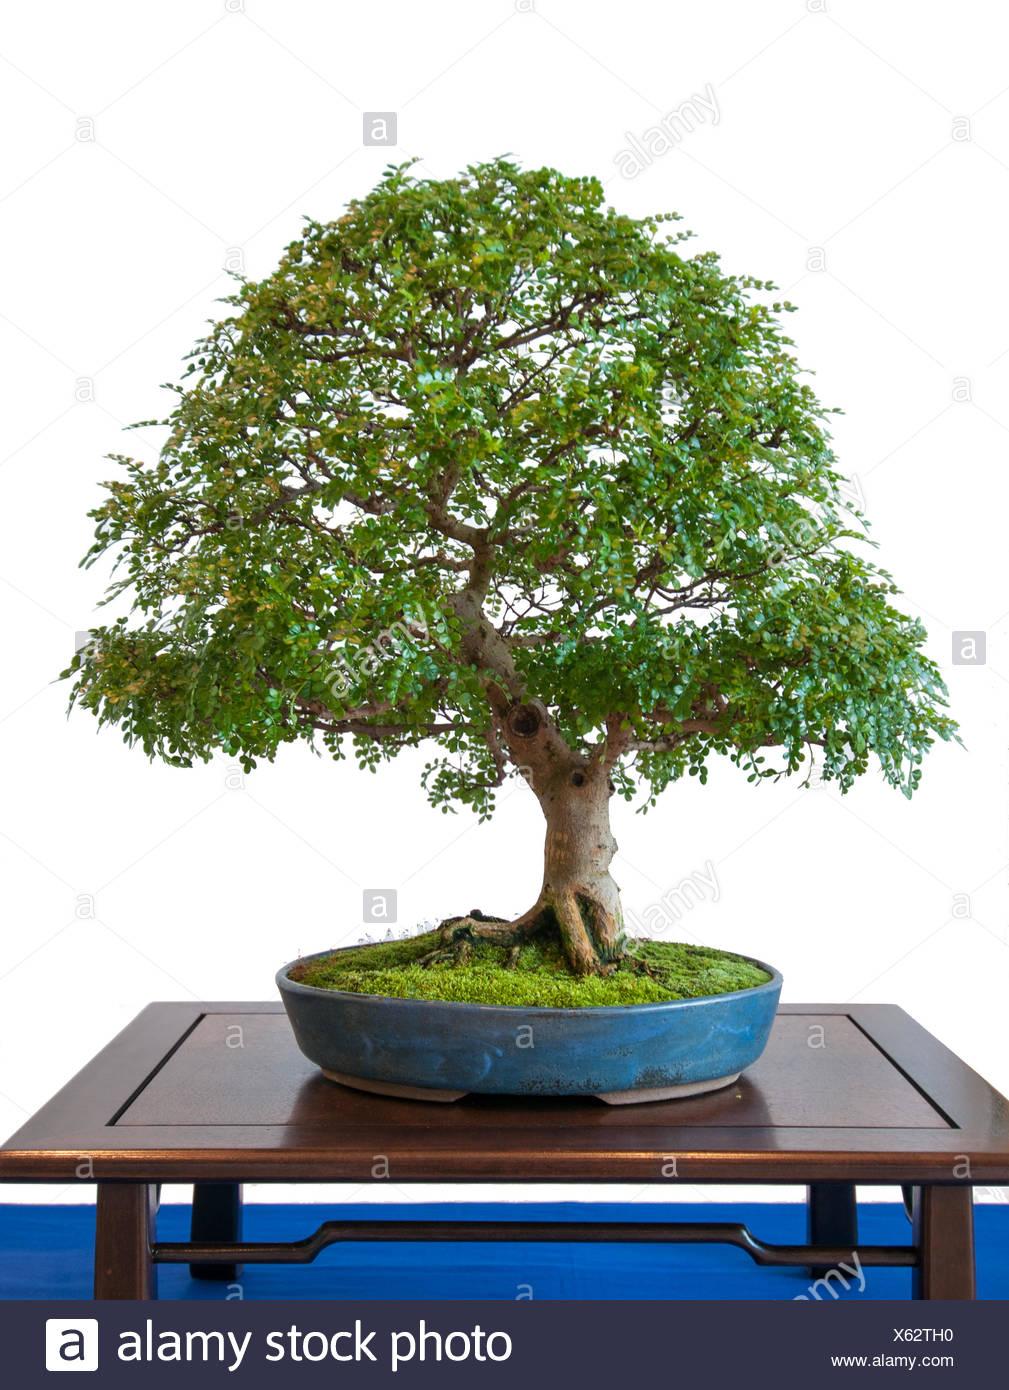 Japanese Pepper Tree Zanthoxylum Piperitum Close Up Of Leaves And Fruit Stock Photo Alamy